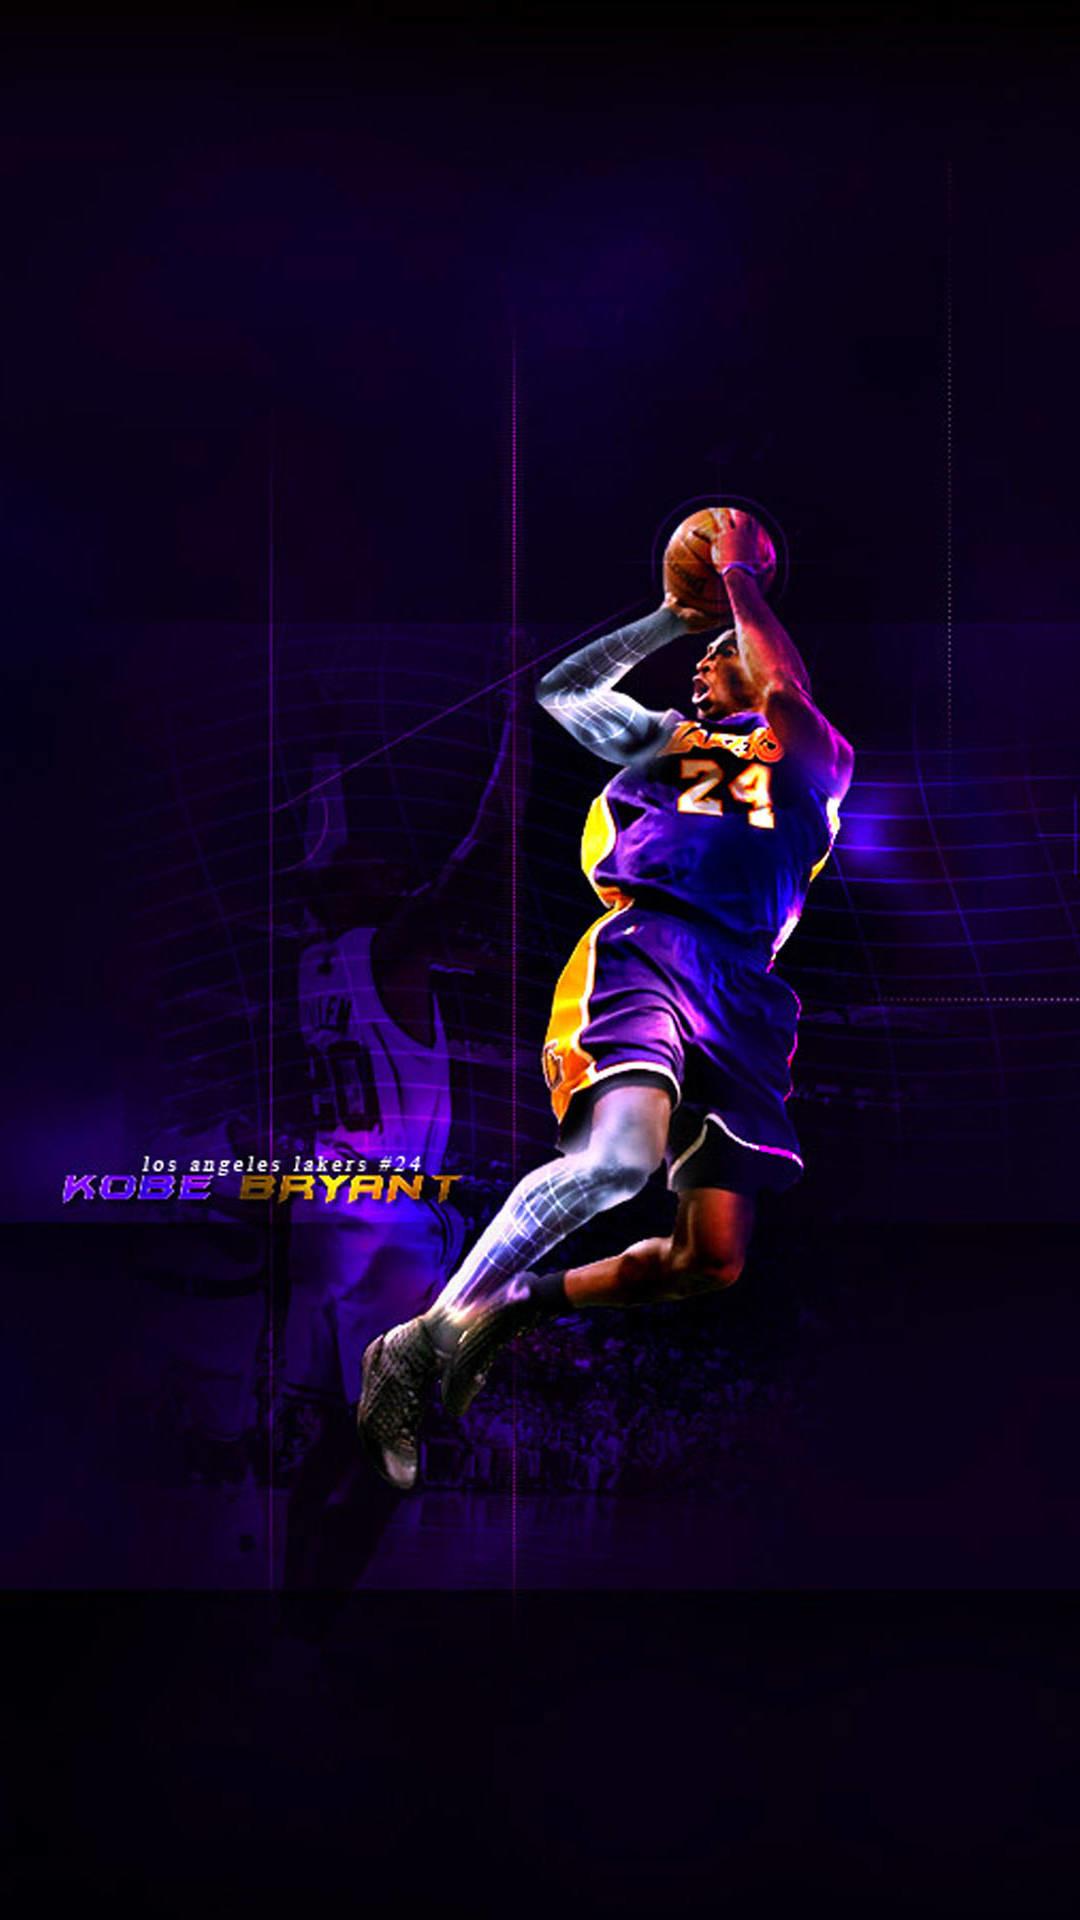 Kobe Bryant Logo Wallpaper 66 Images